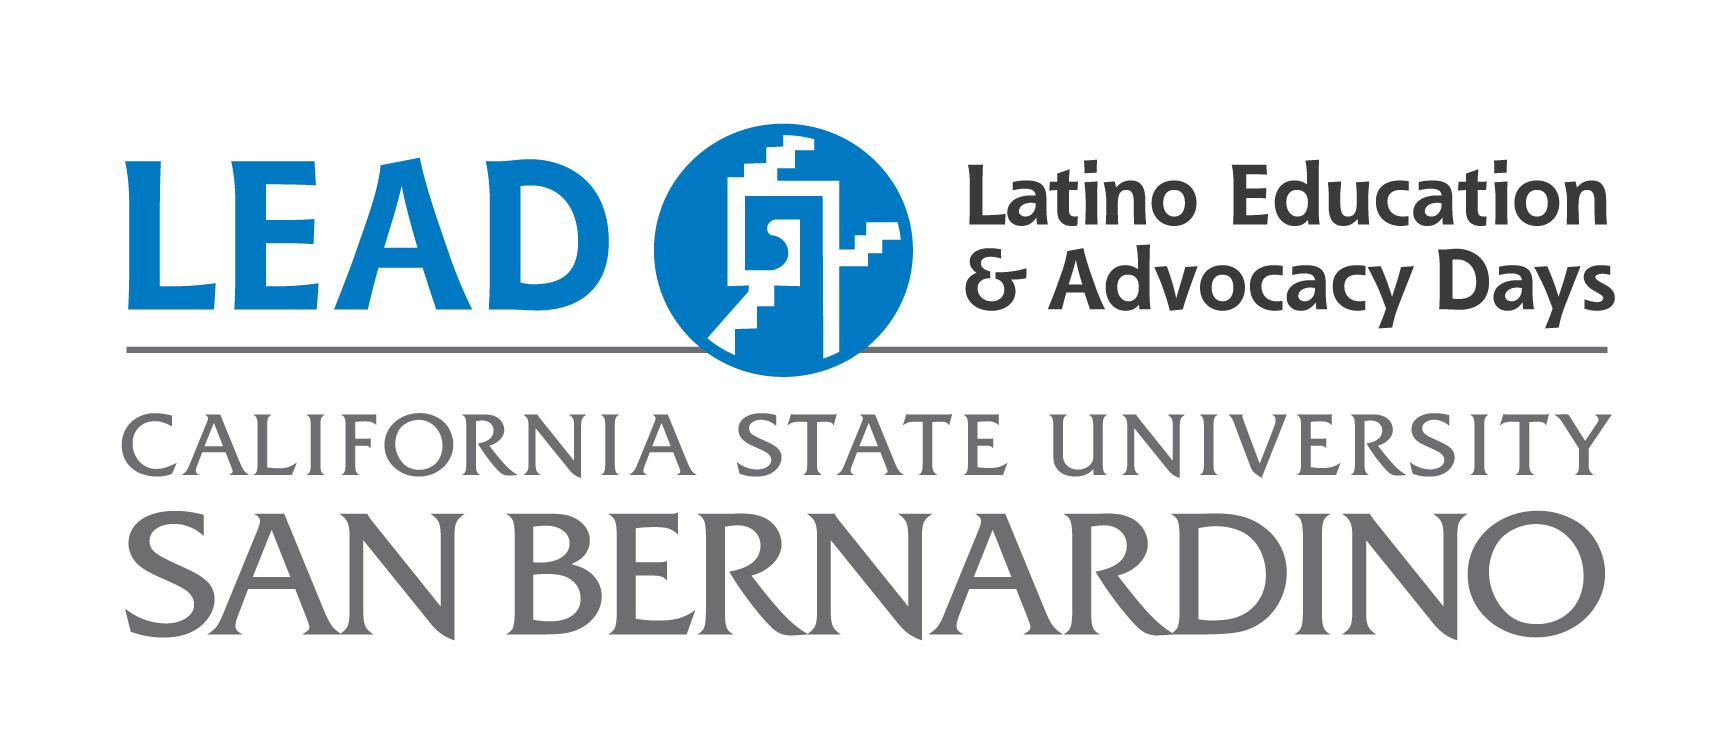 LEAD Latino Education & Advocacy Days